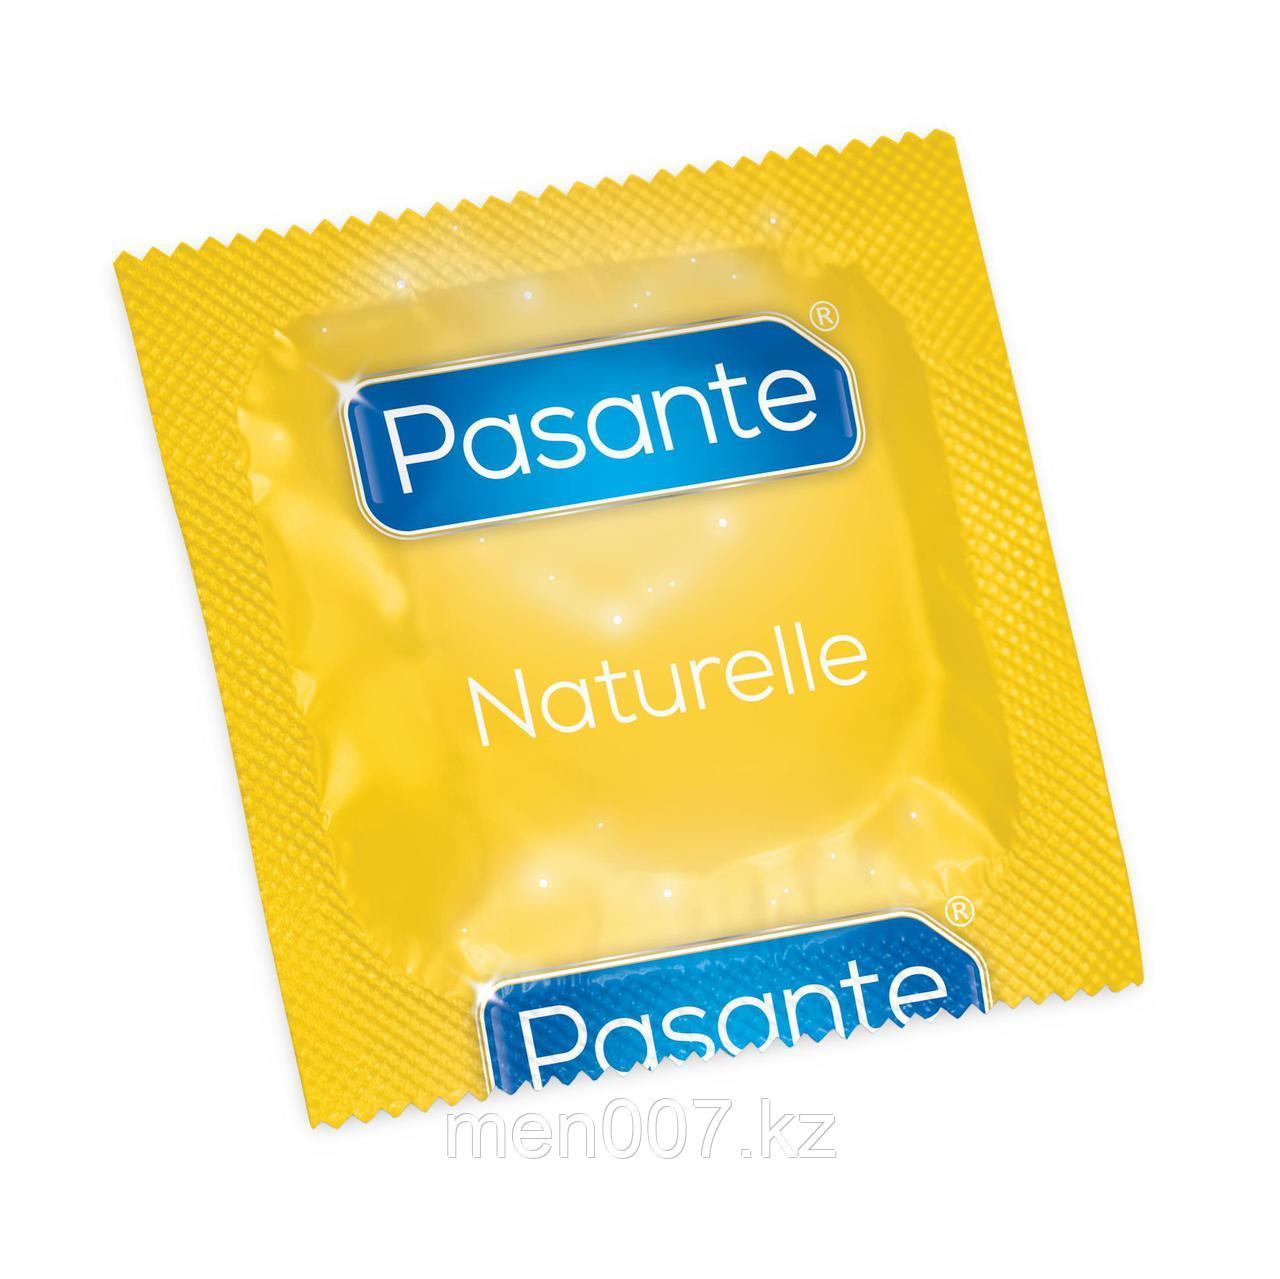 Pasante Naturelle (презерватив)